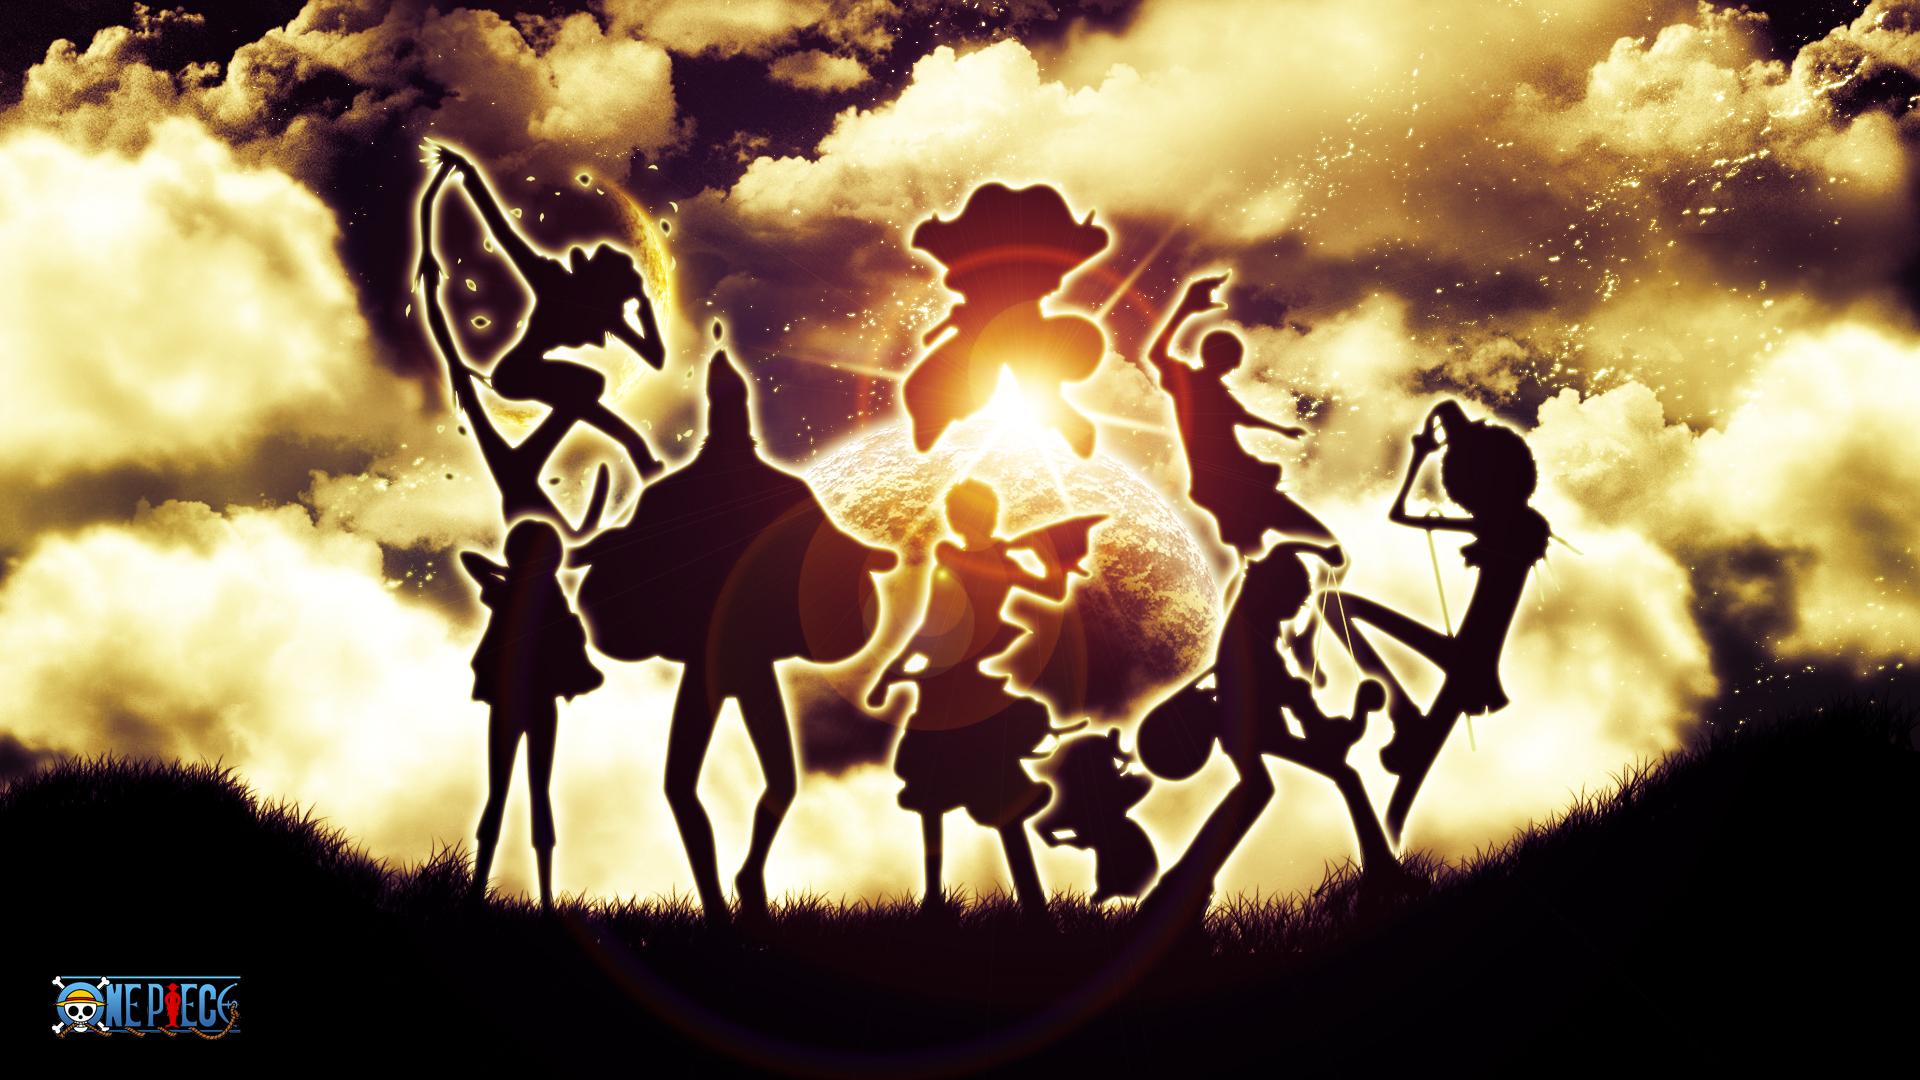 One Piece Hd Wallpapers One Piece Hd Wallpaper 1080p 84979 Hd Wallpaper Backgrounds Download